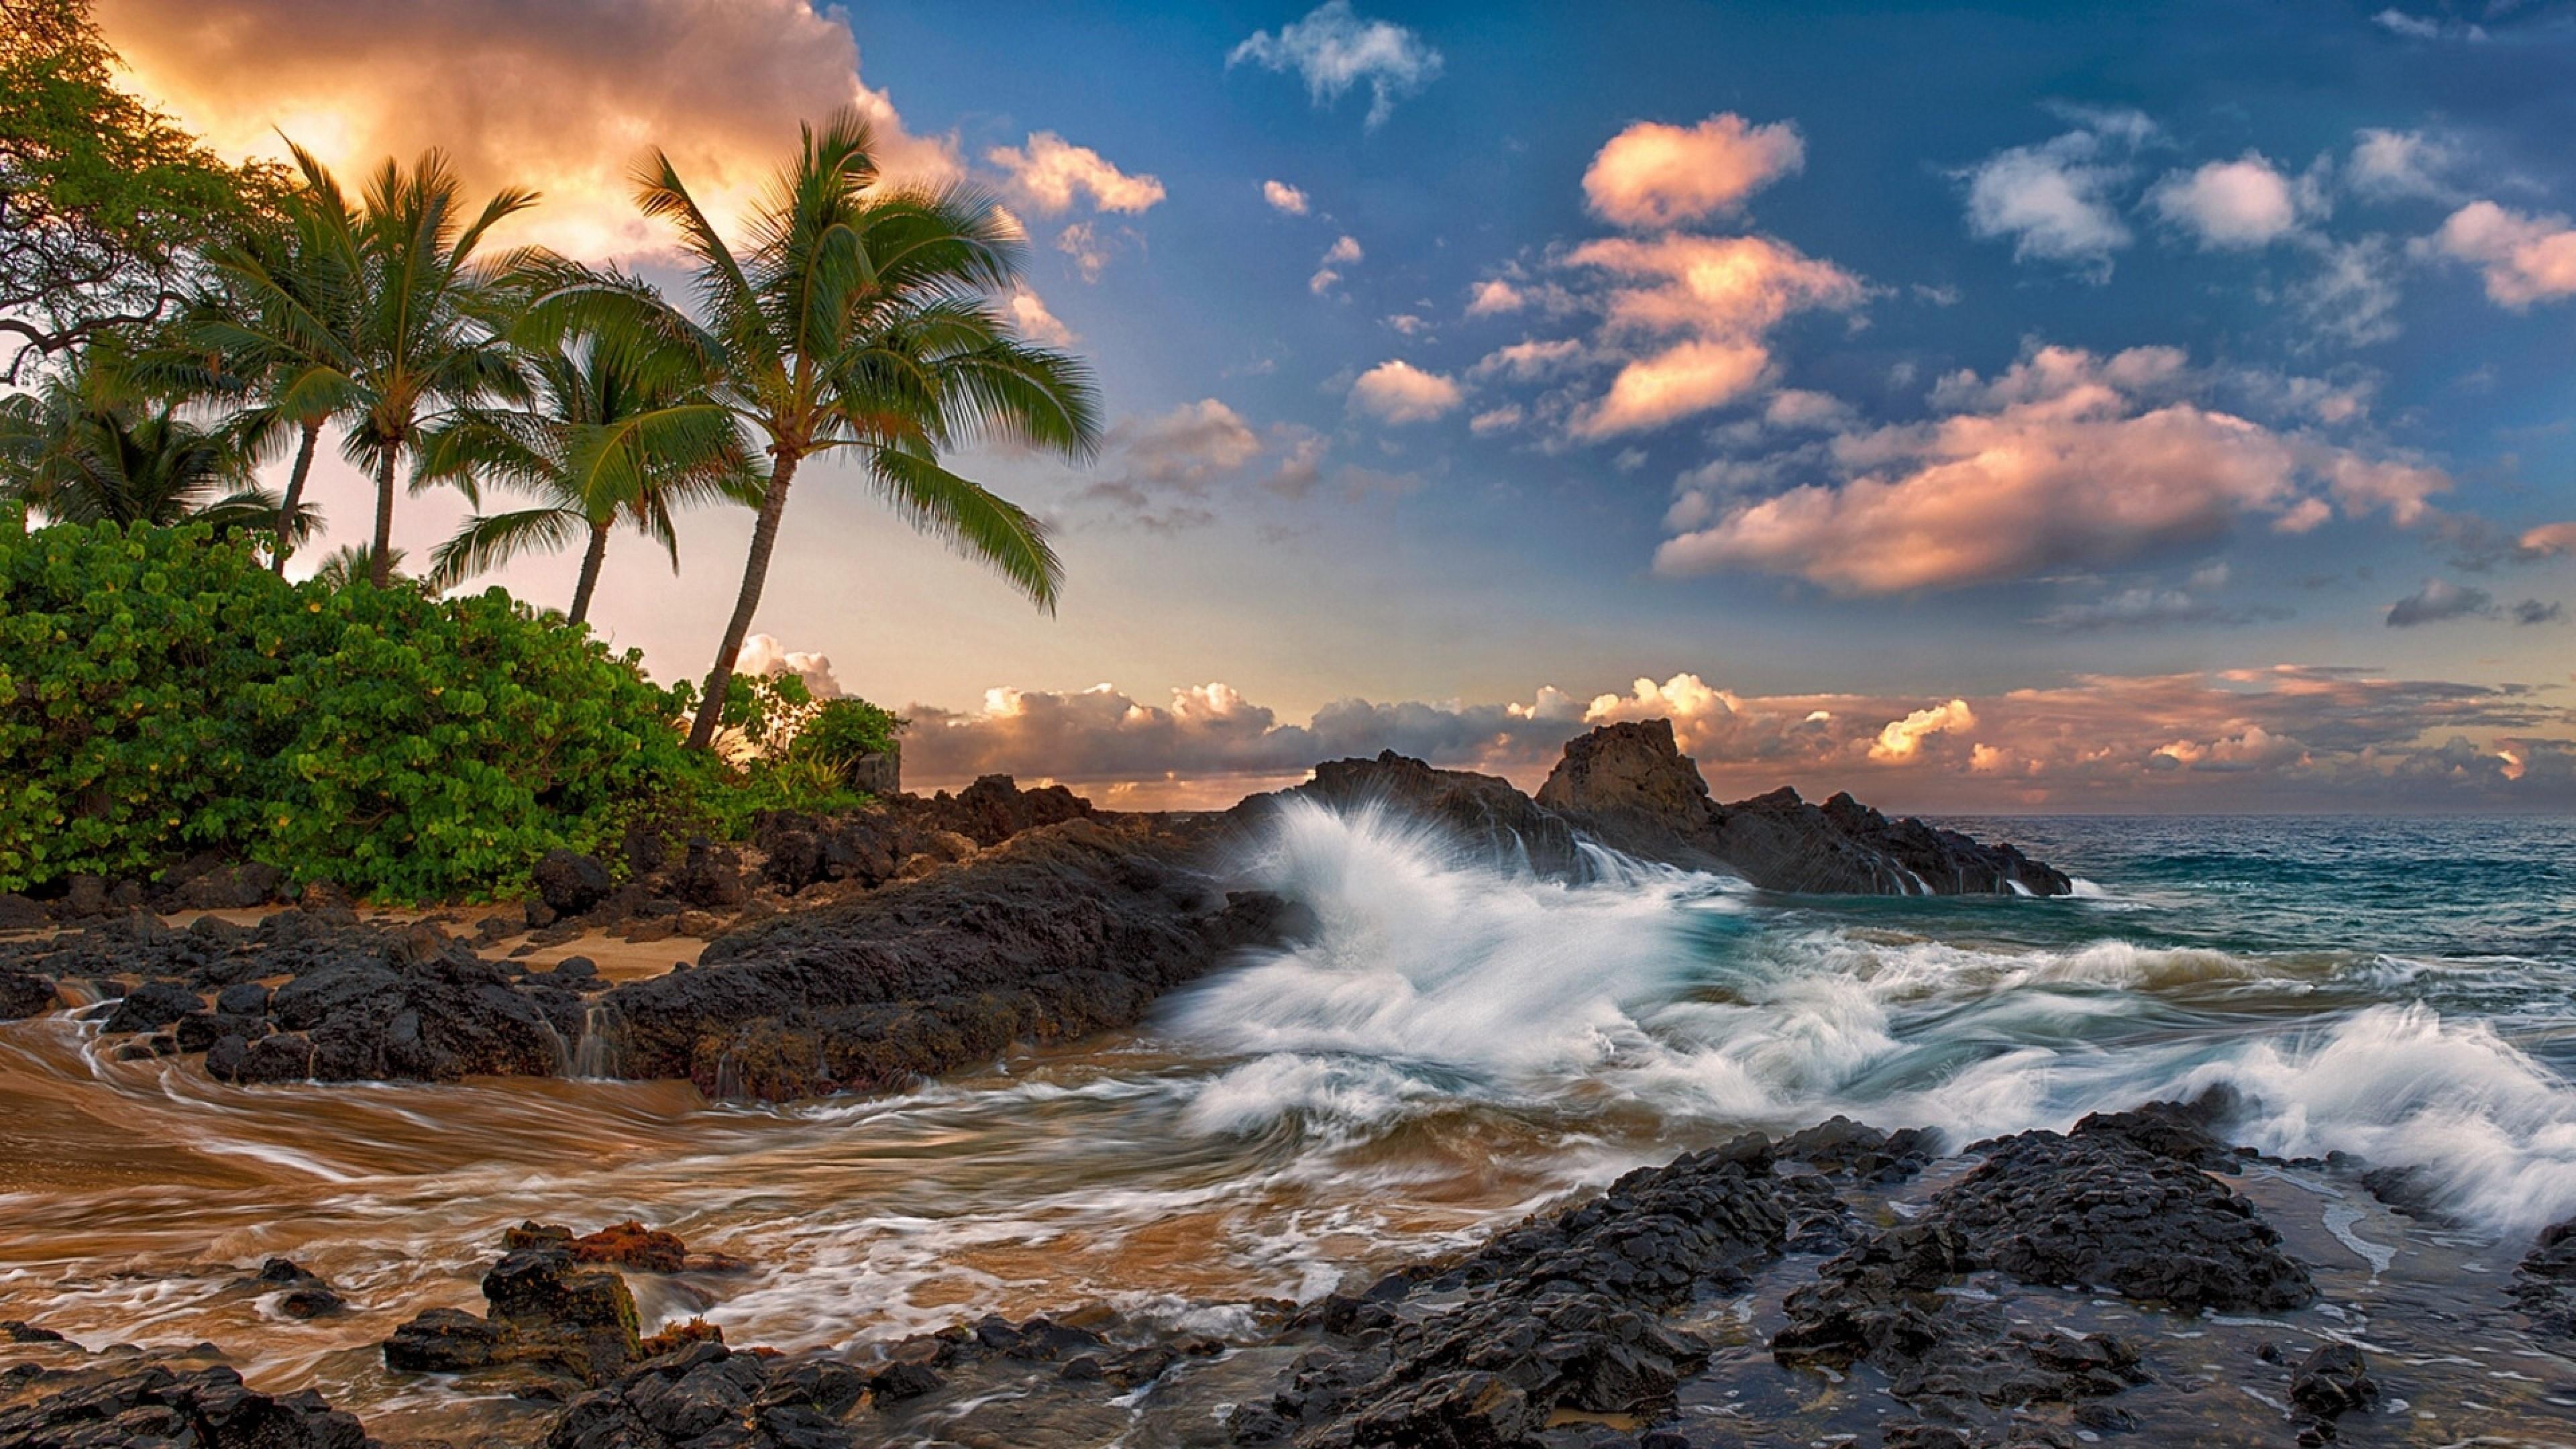 Coast of Maui wallpaper